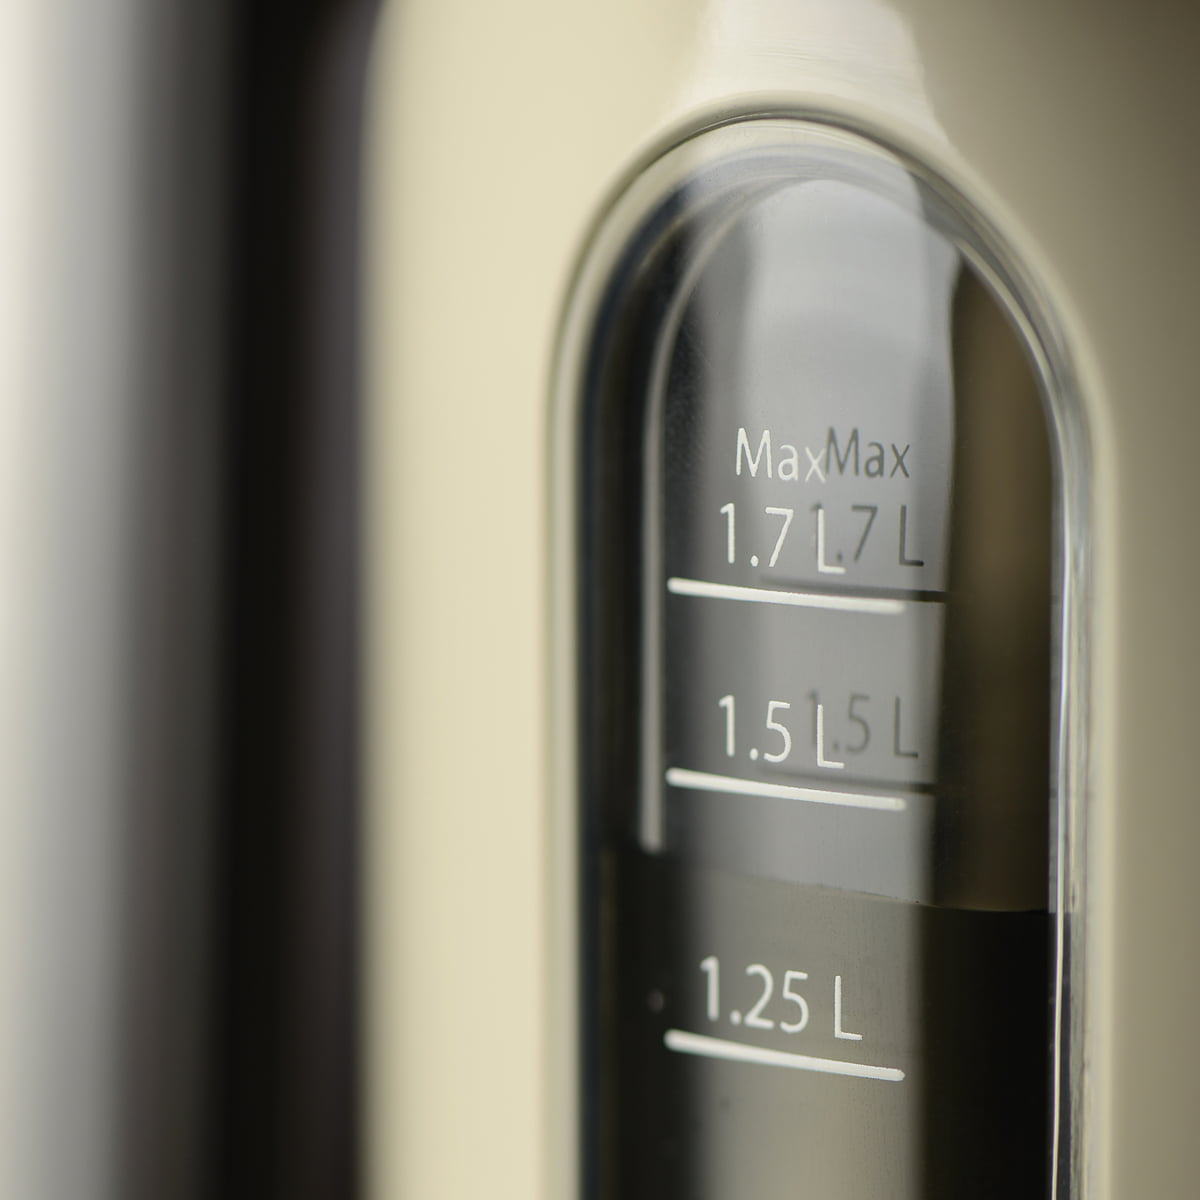 Kitchenaid Water Boiler